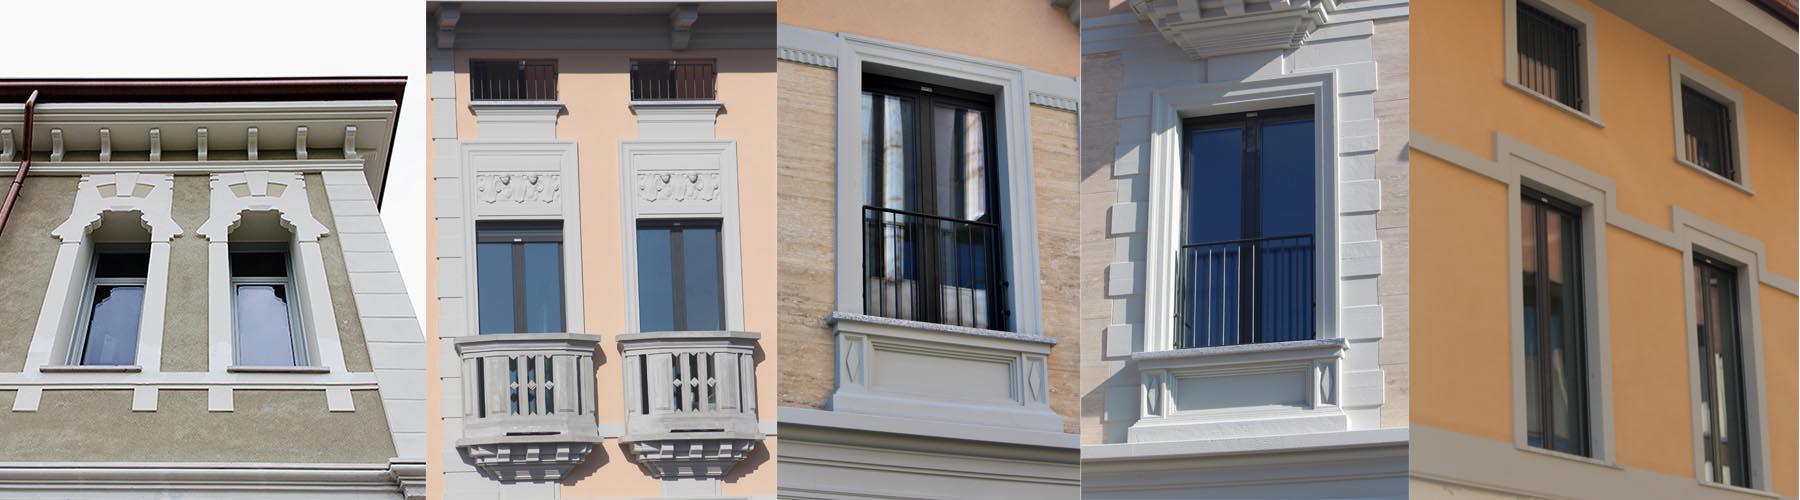 Cornice per finestre esterne